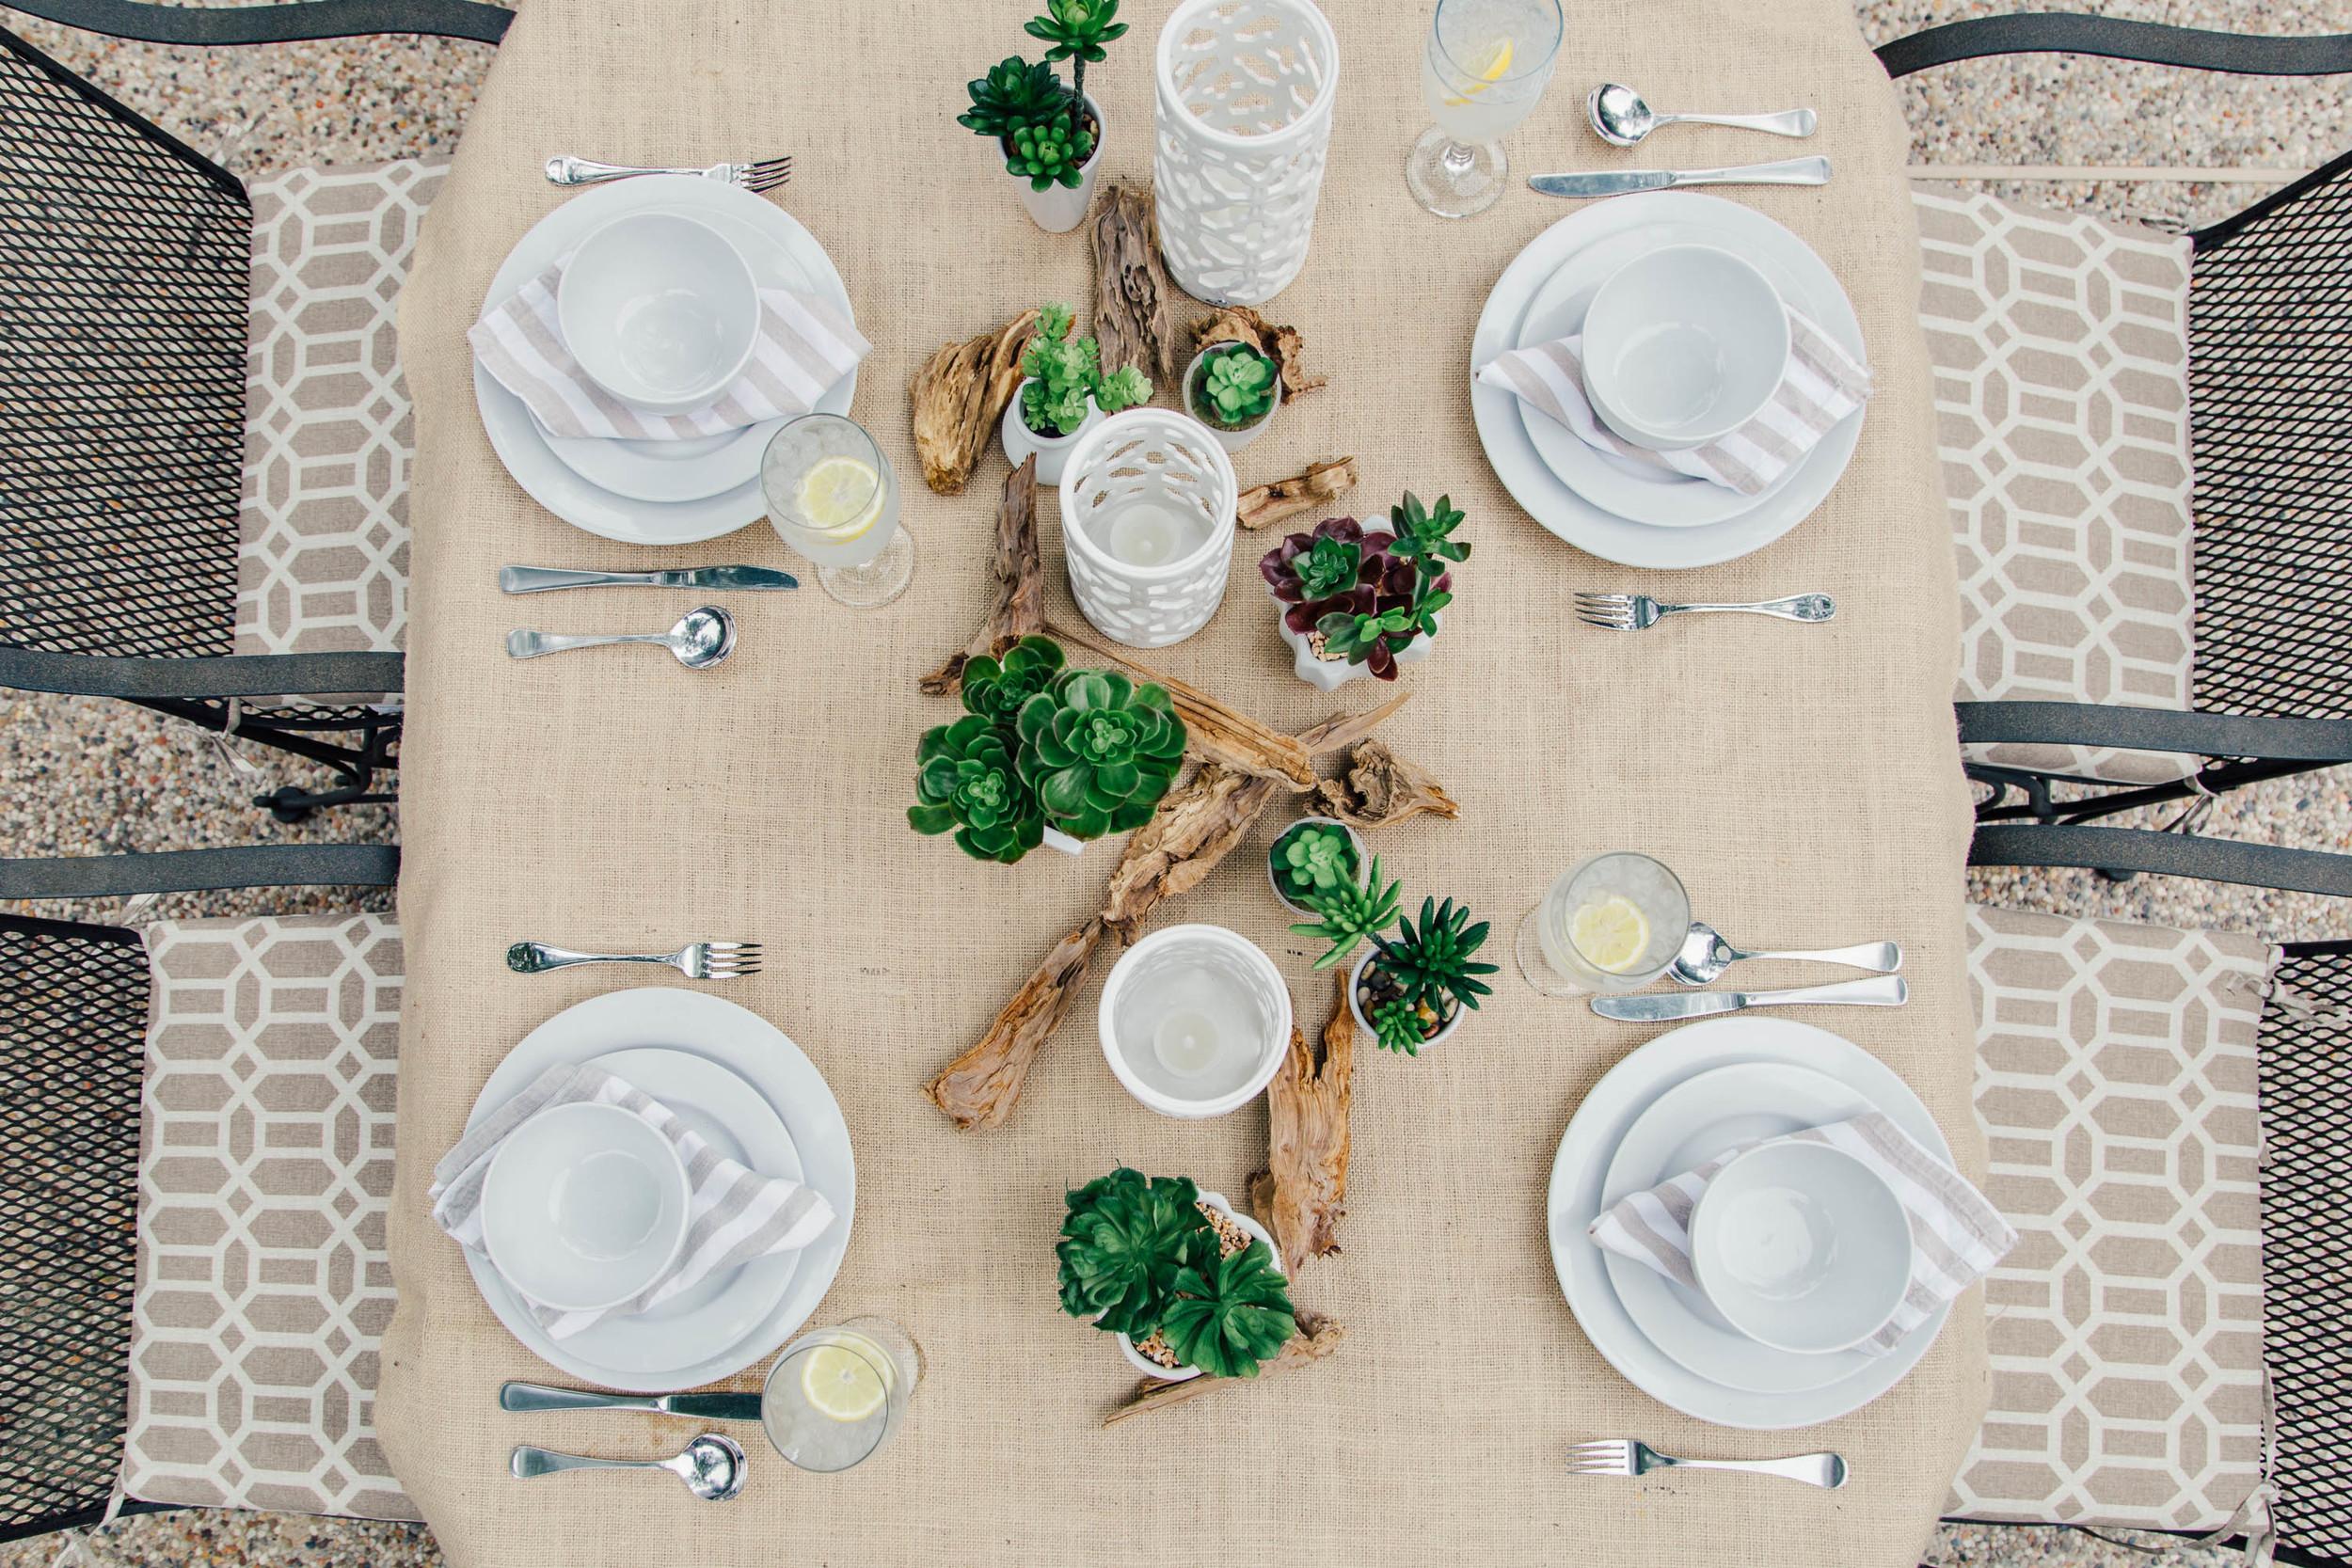 Tabletop   Interior Designer: Carla Aston / Photographer: Tori Aston